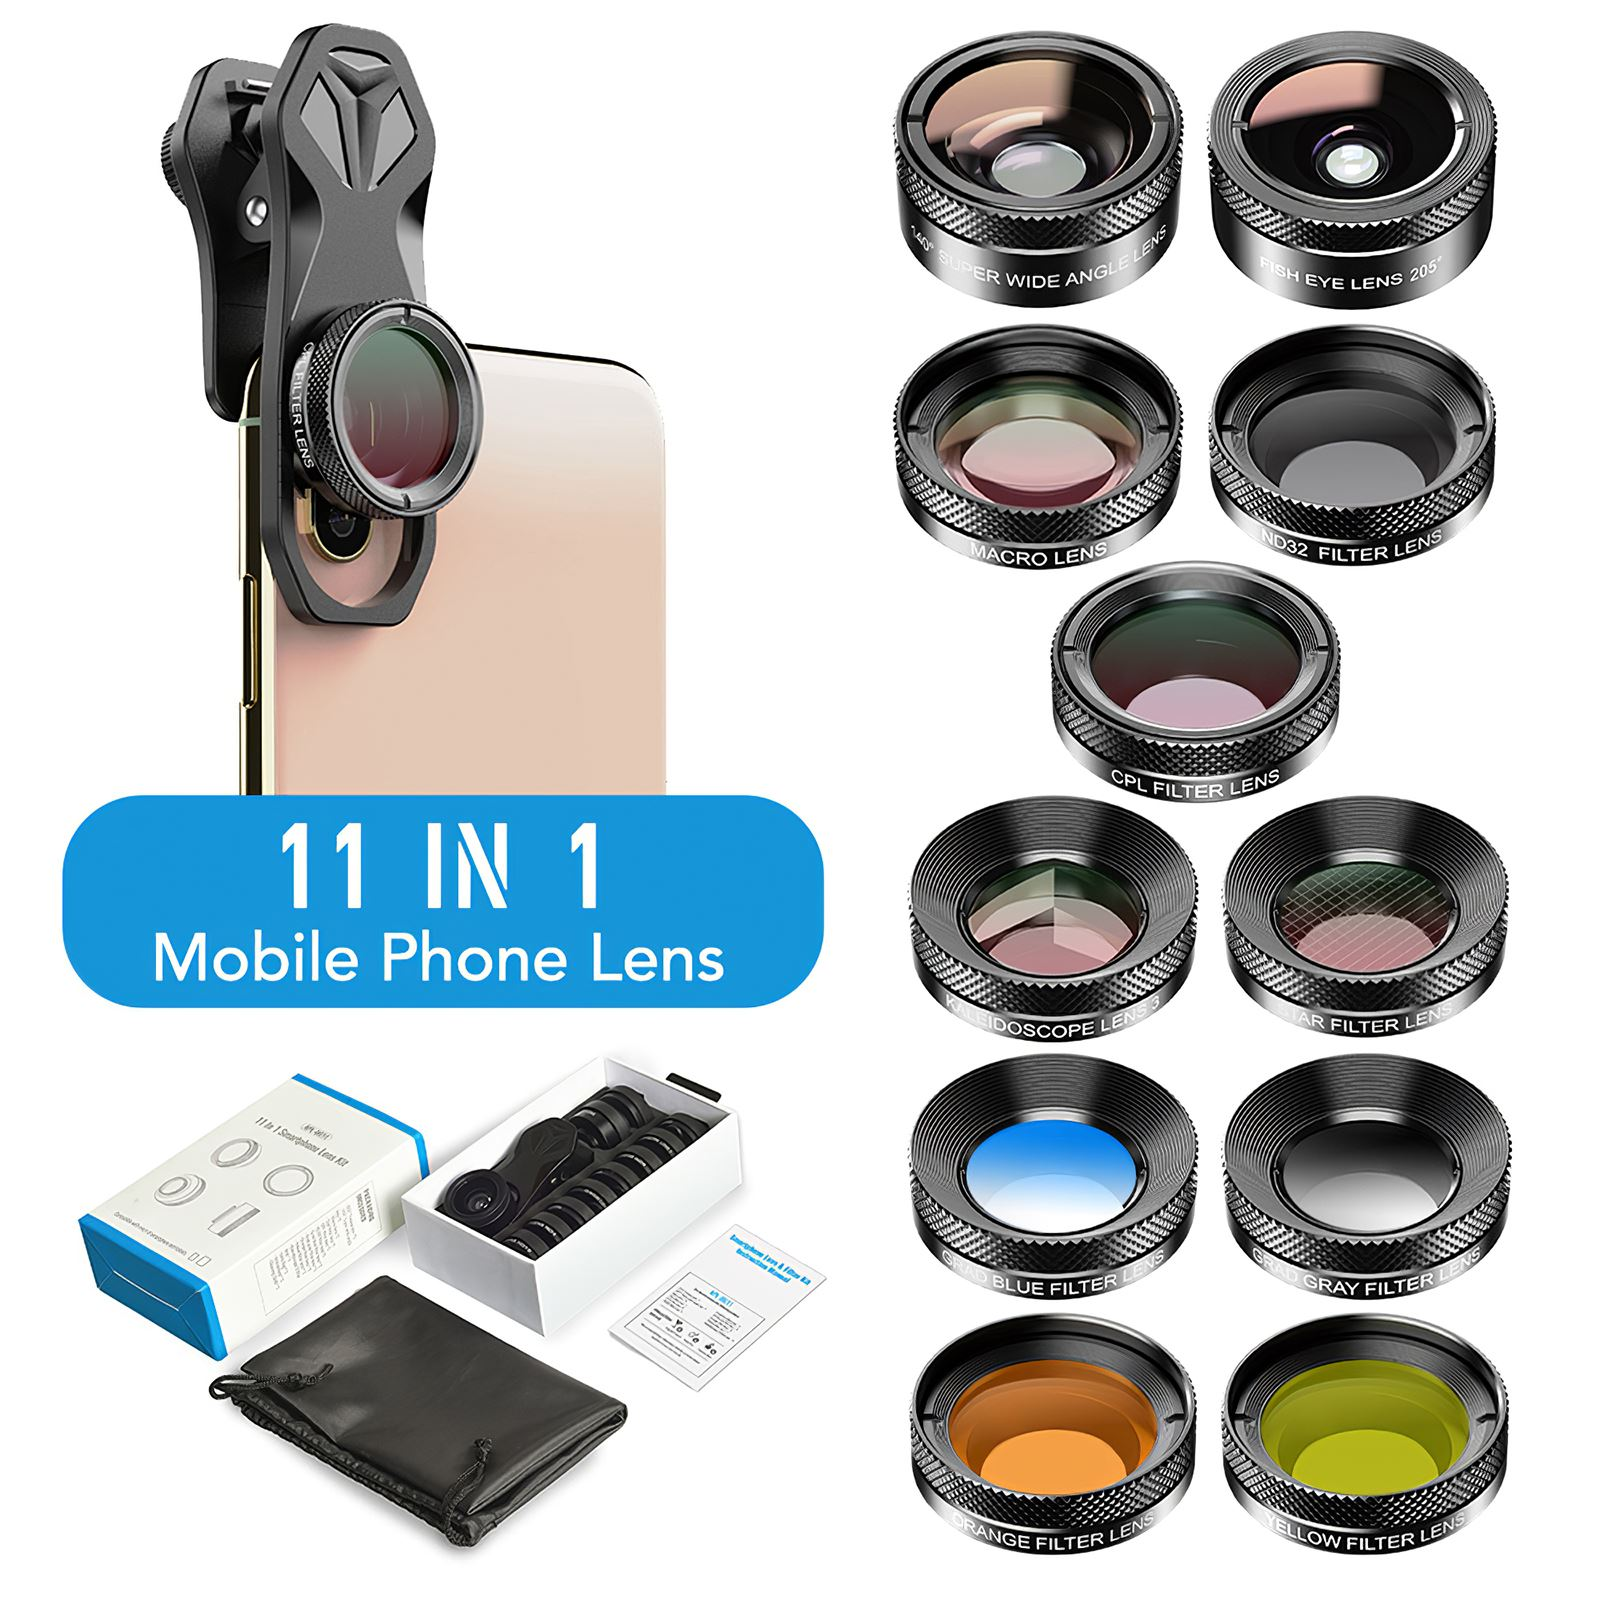 11 in1 الهاتف عدسة الكاميرا مجموعة للآيفون لسامسونج الهاتف عدسة مجموعة فيش زاوية واسعة كامل/غراد تصفية CPL ND ماكرو عدسة المحمول